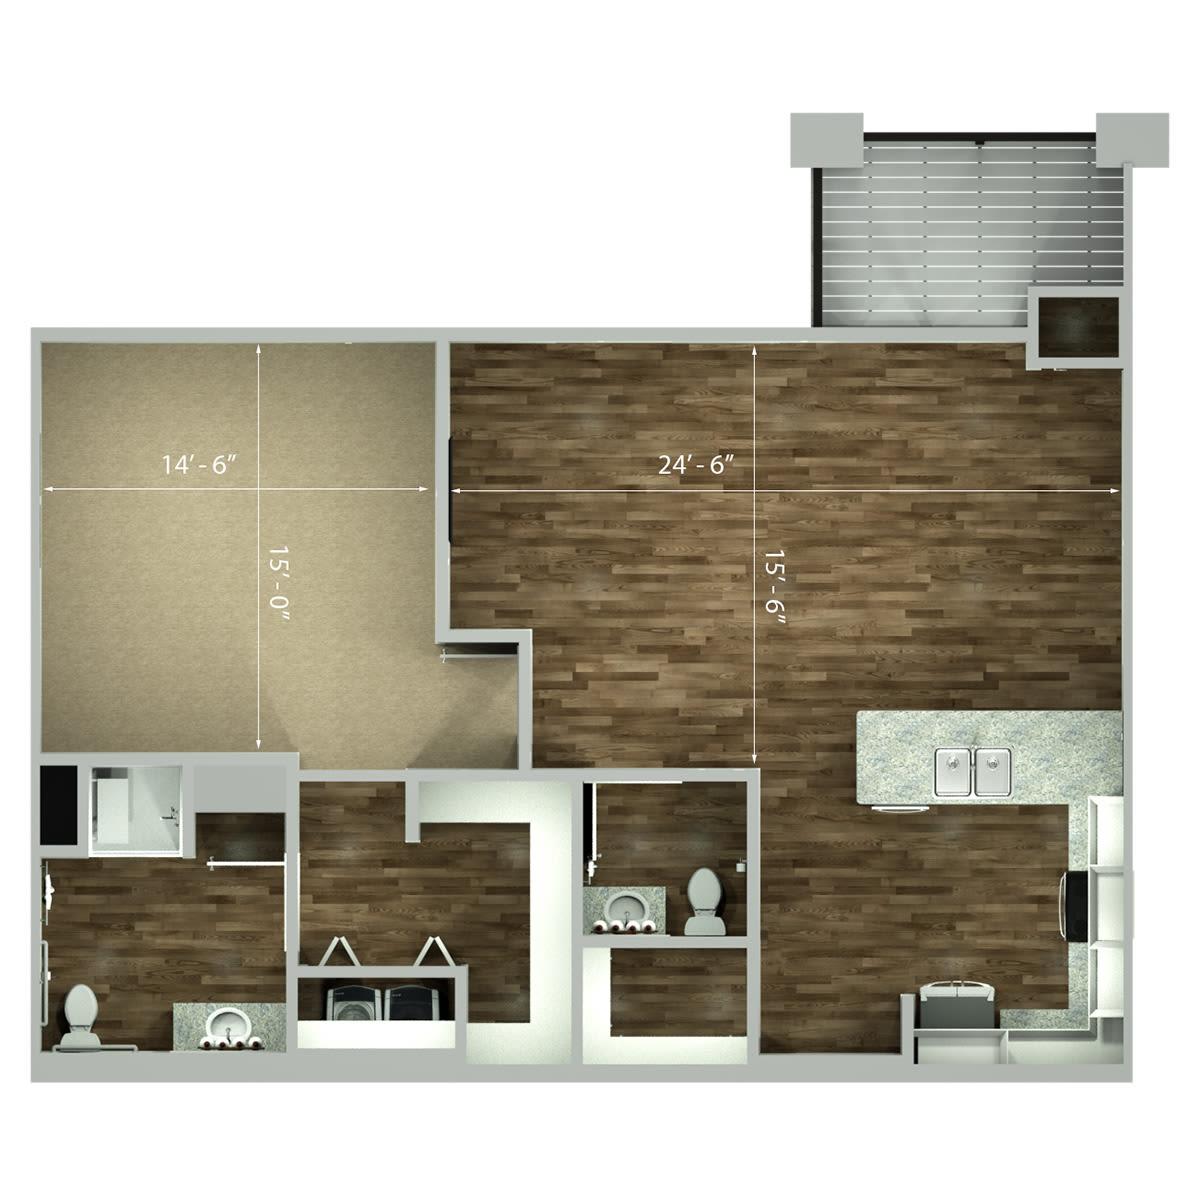 One Bedroom Large   1,036 Sq Ft. Leawood Large One Bedroom Floor Plan